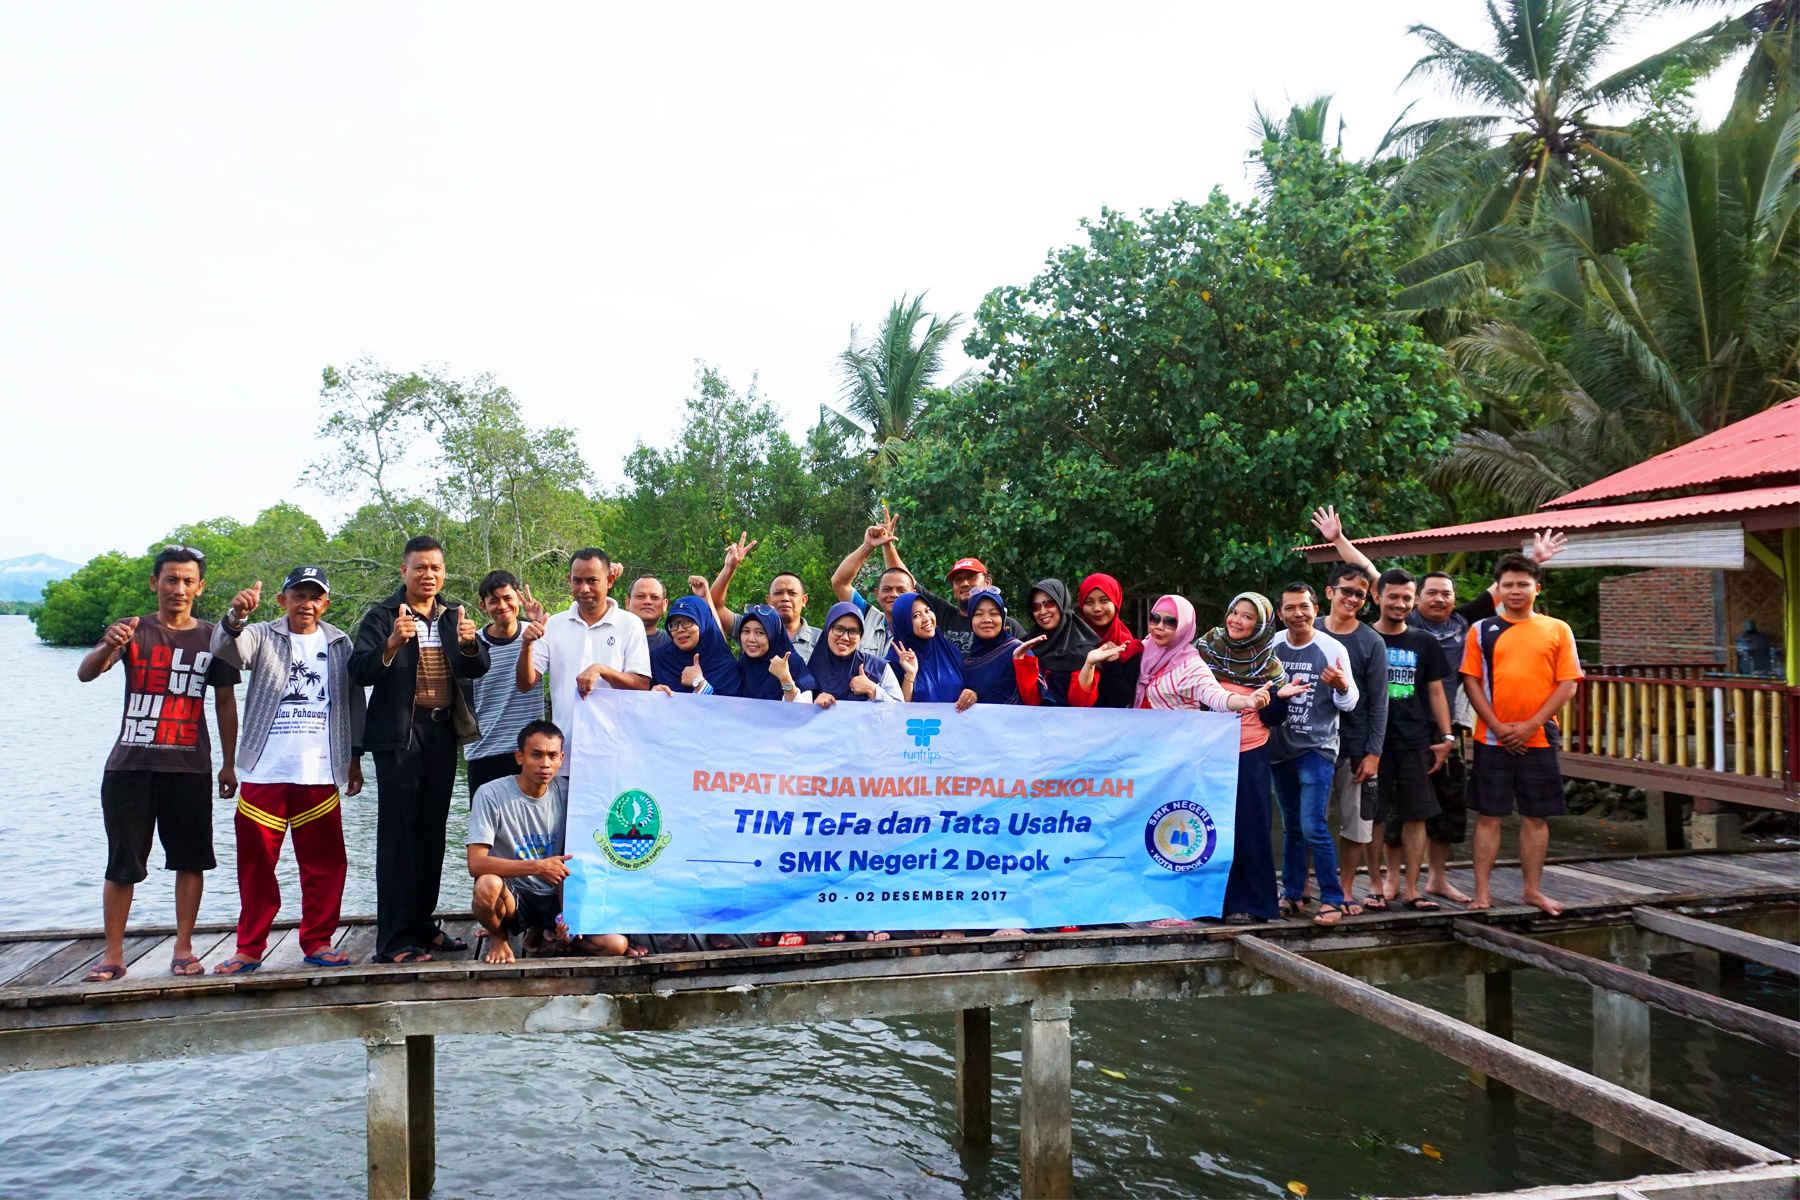 Paket Wisata Pulau Pahawang Funtrips Tour Open Trip Every Weekend 2017